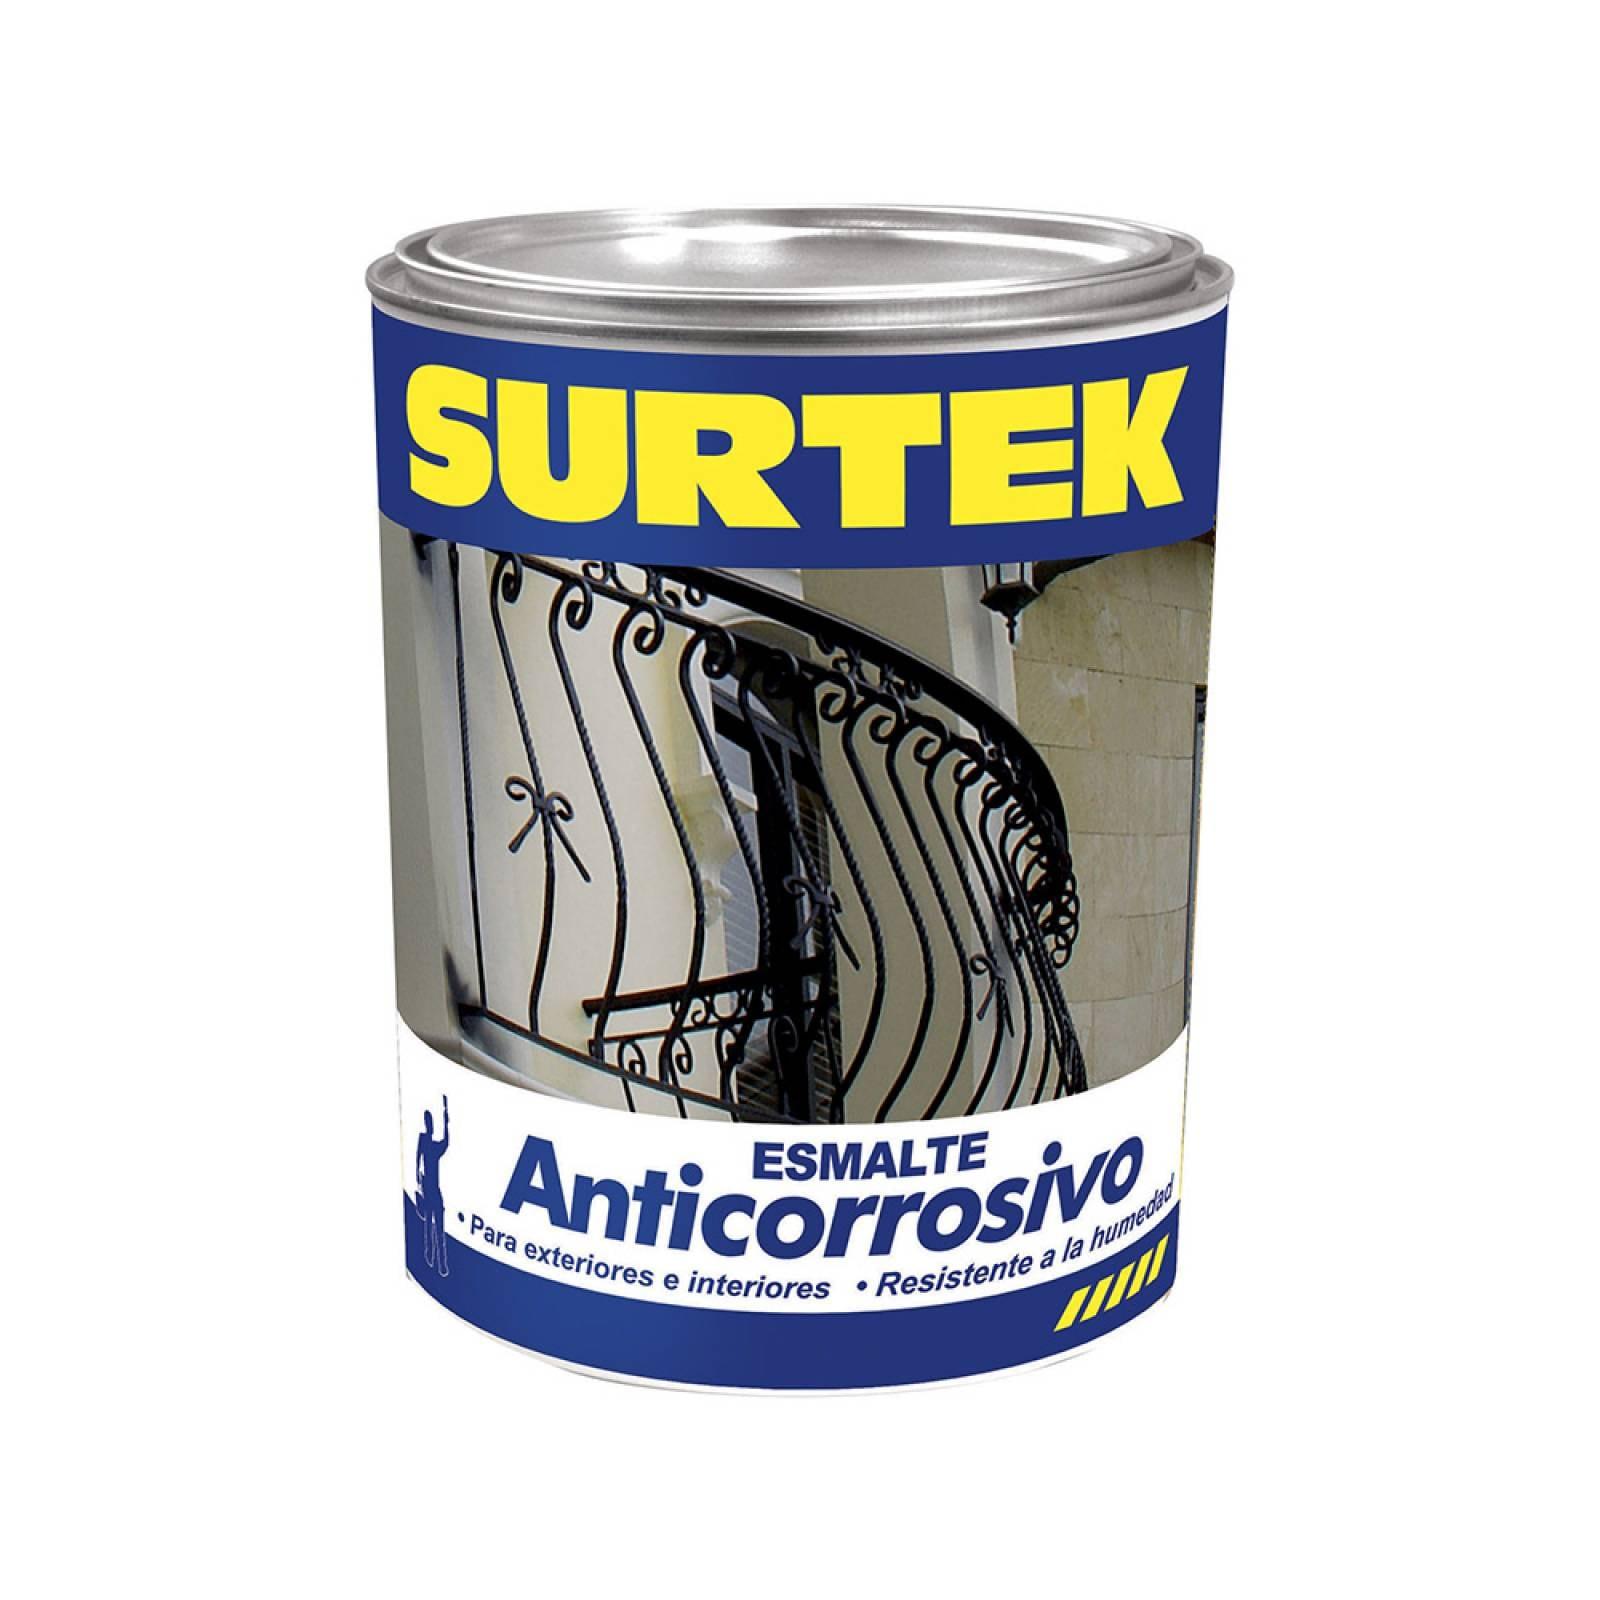 Esmalte anticorrosivo blanco 1lt SP30200 Surtek